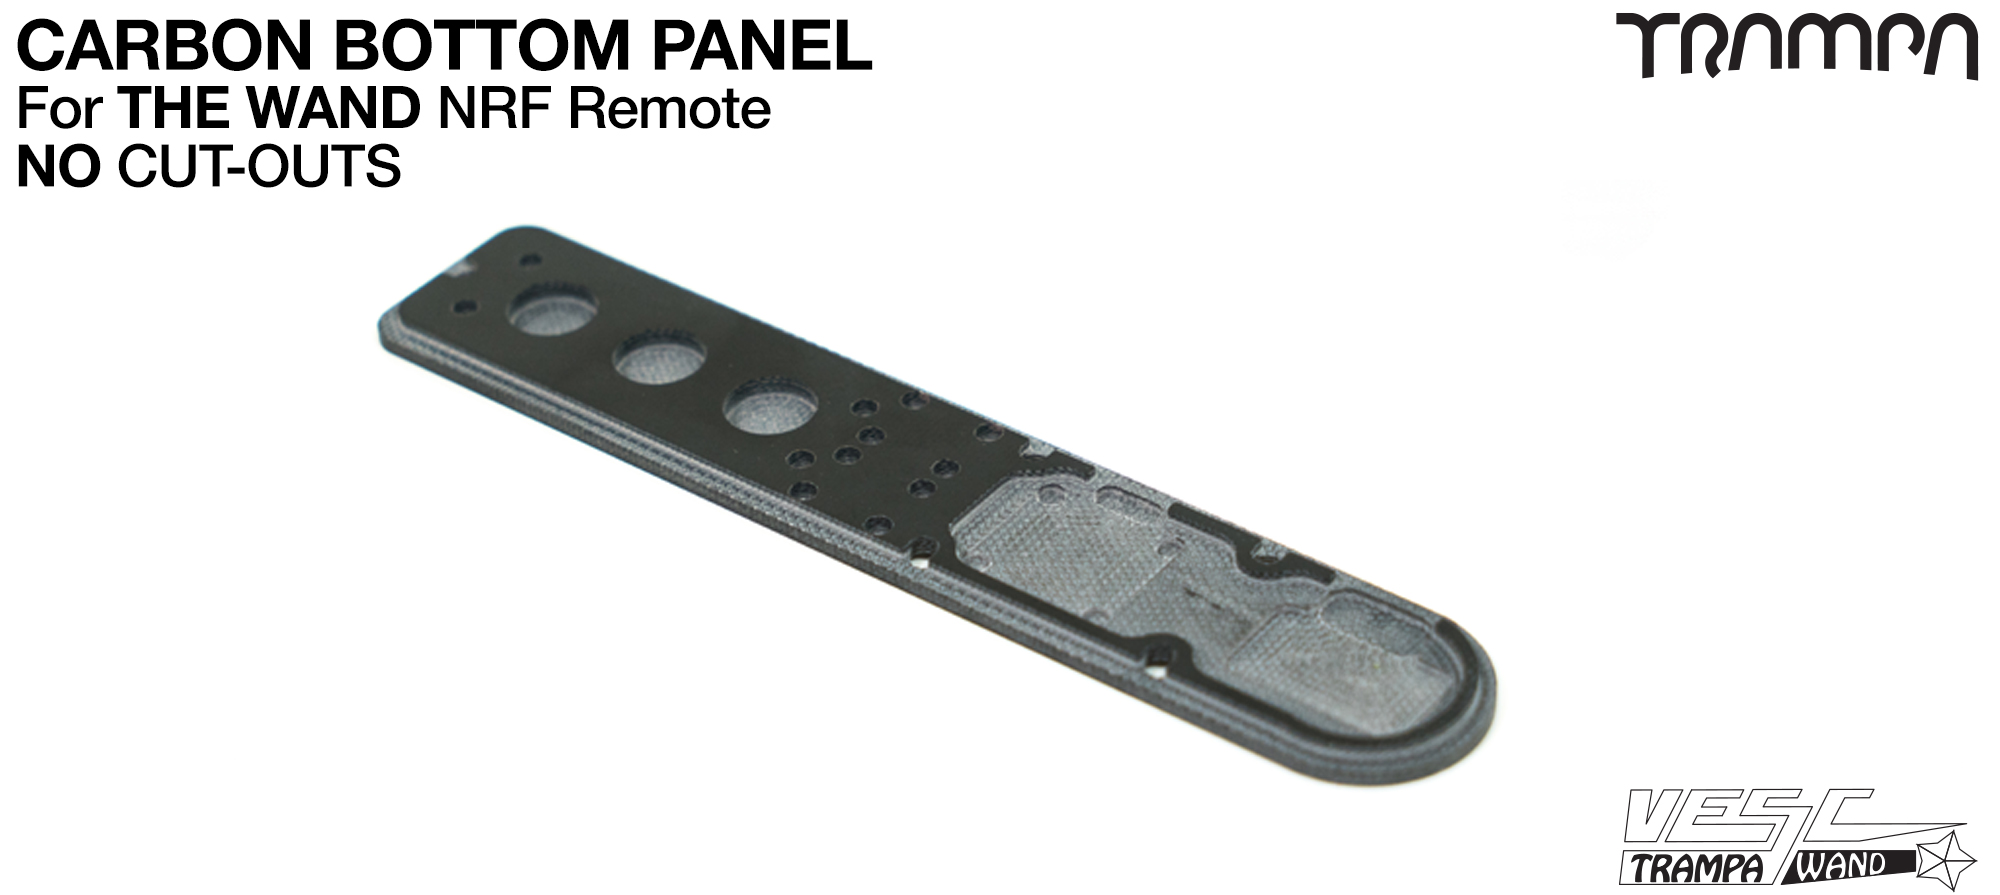 WAND Part D Carbon Bottom Panel - No Trigger